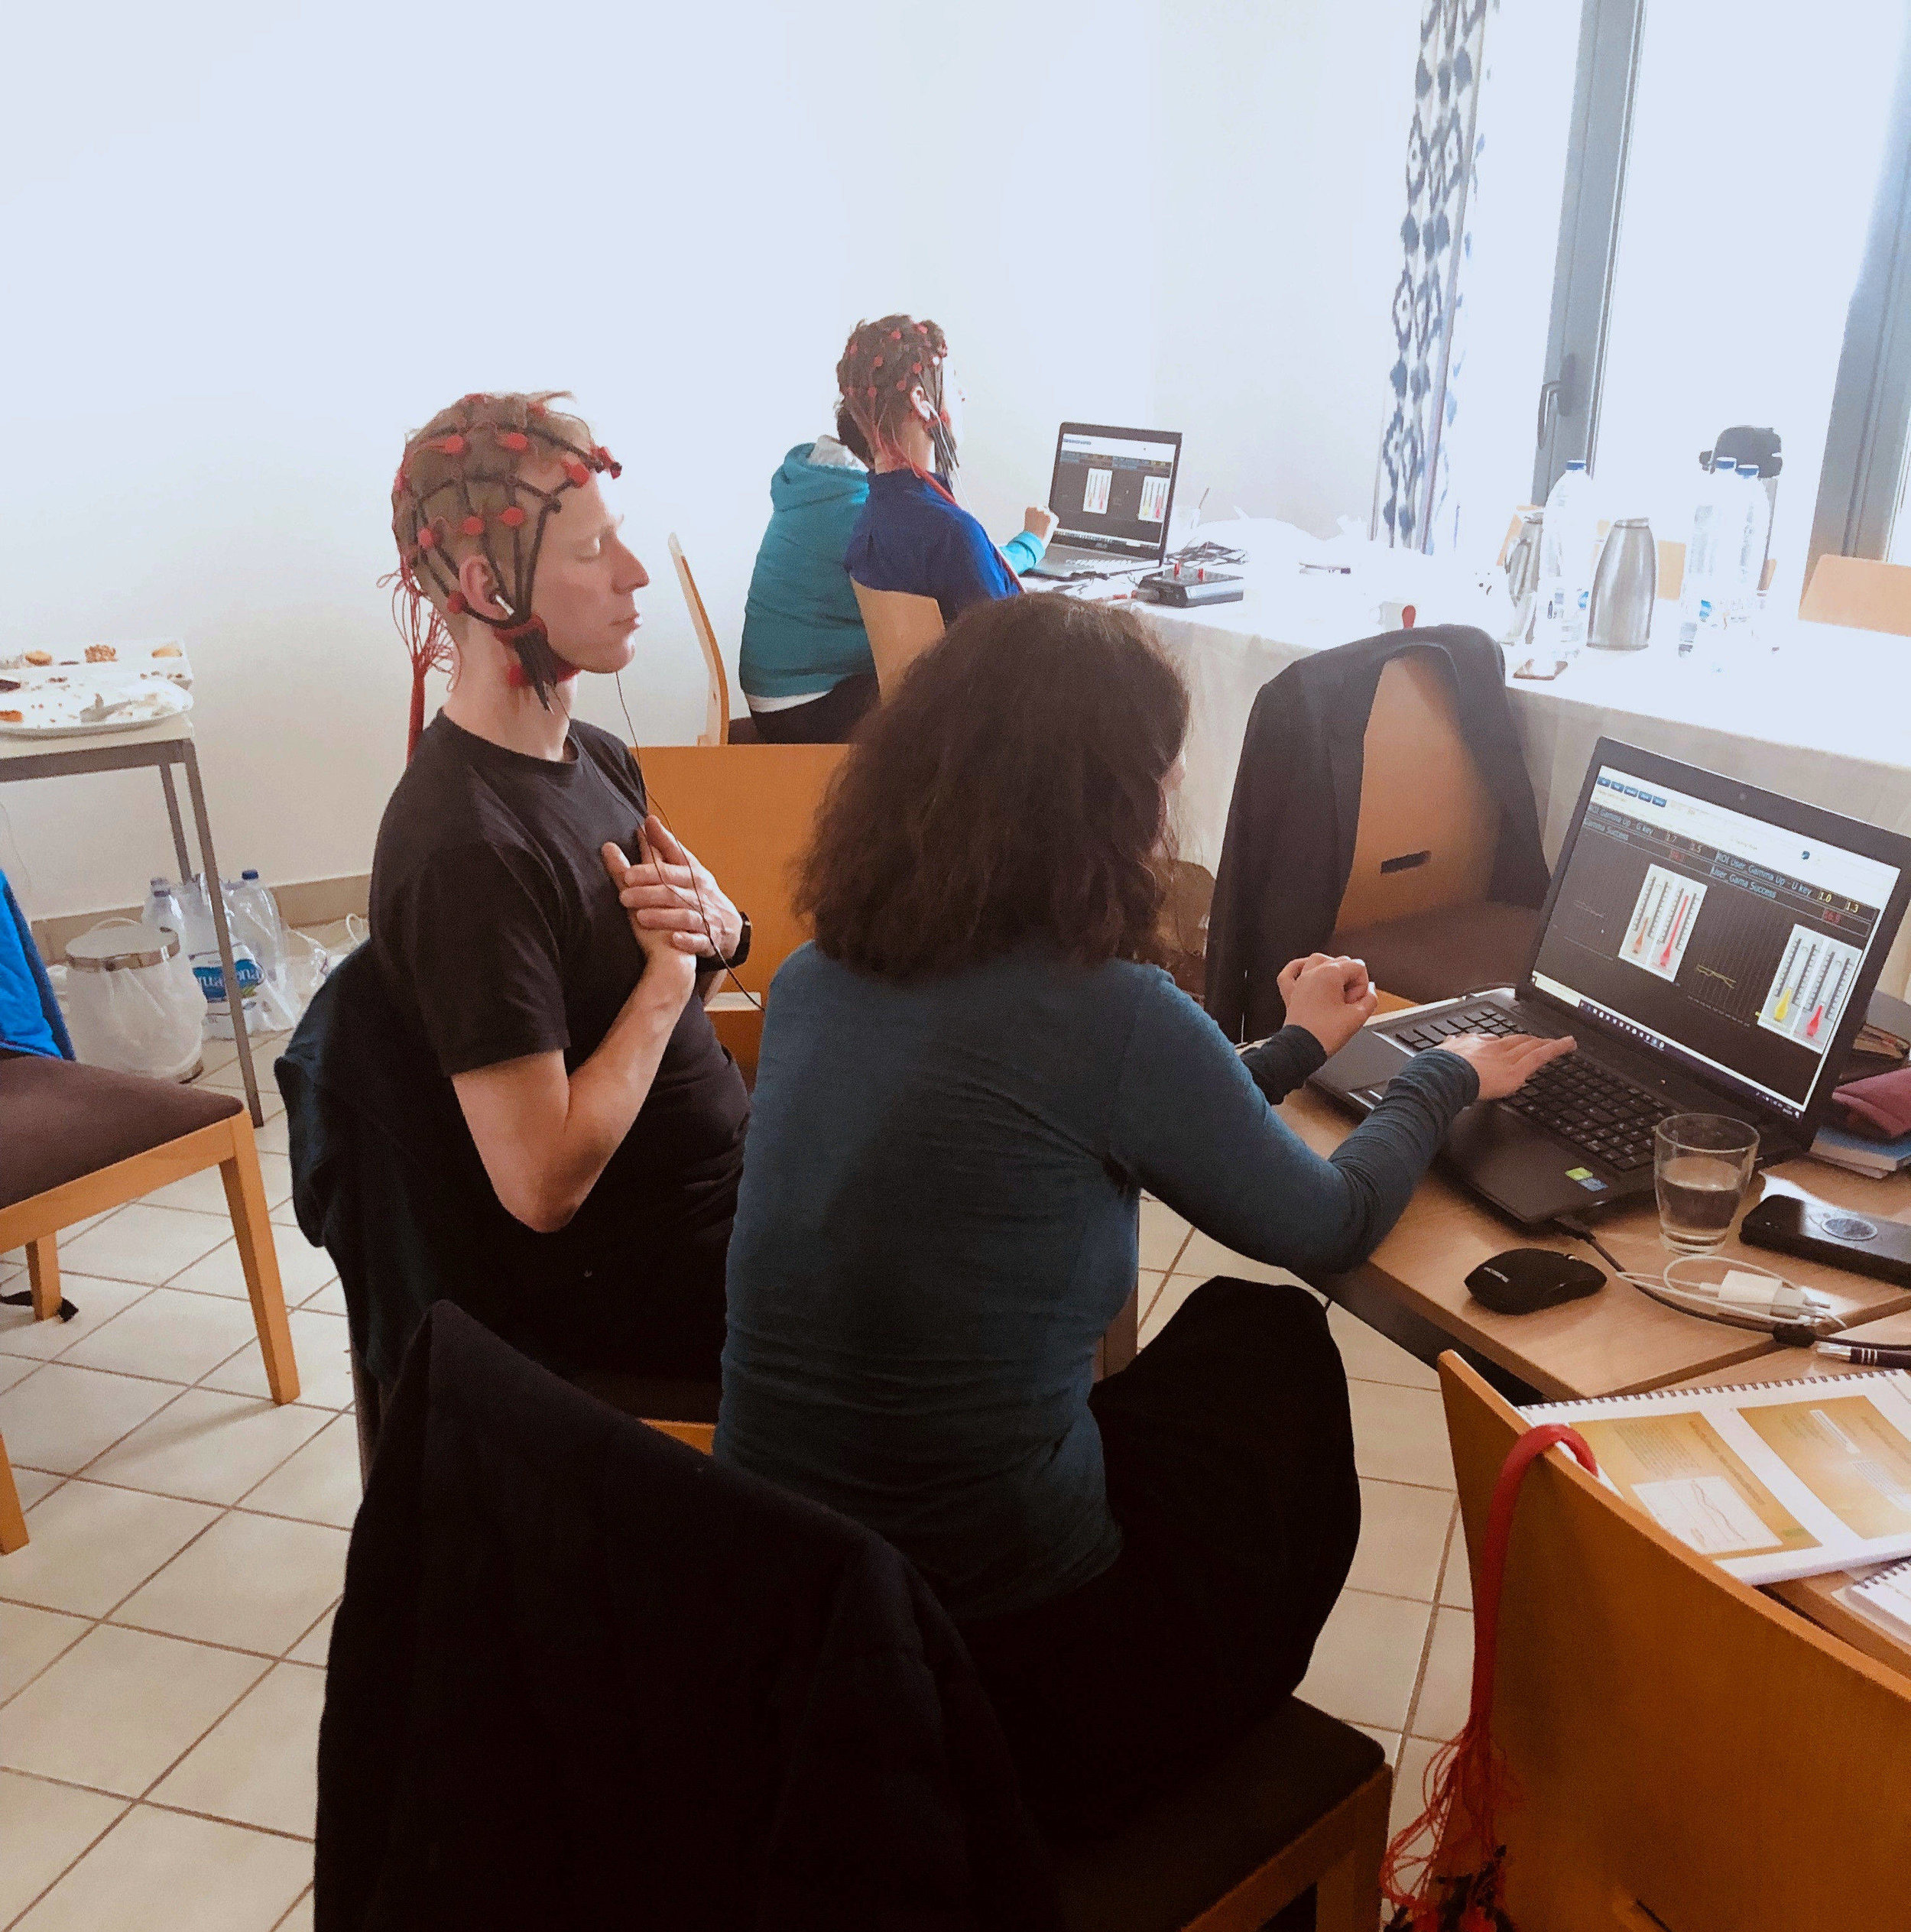 EEG NeuroMeditation Workshop